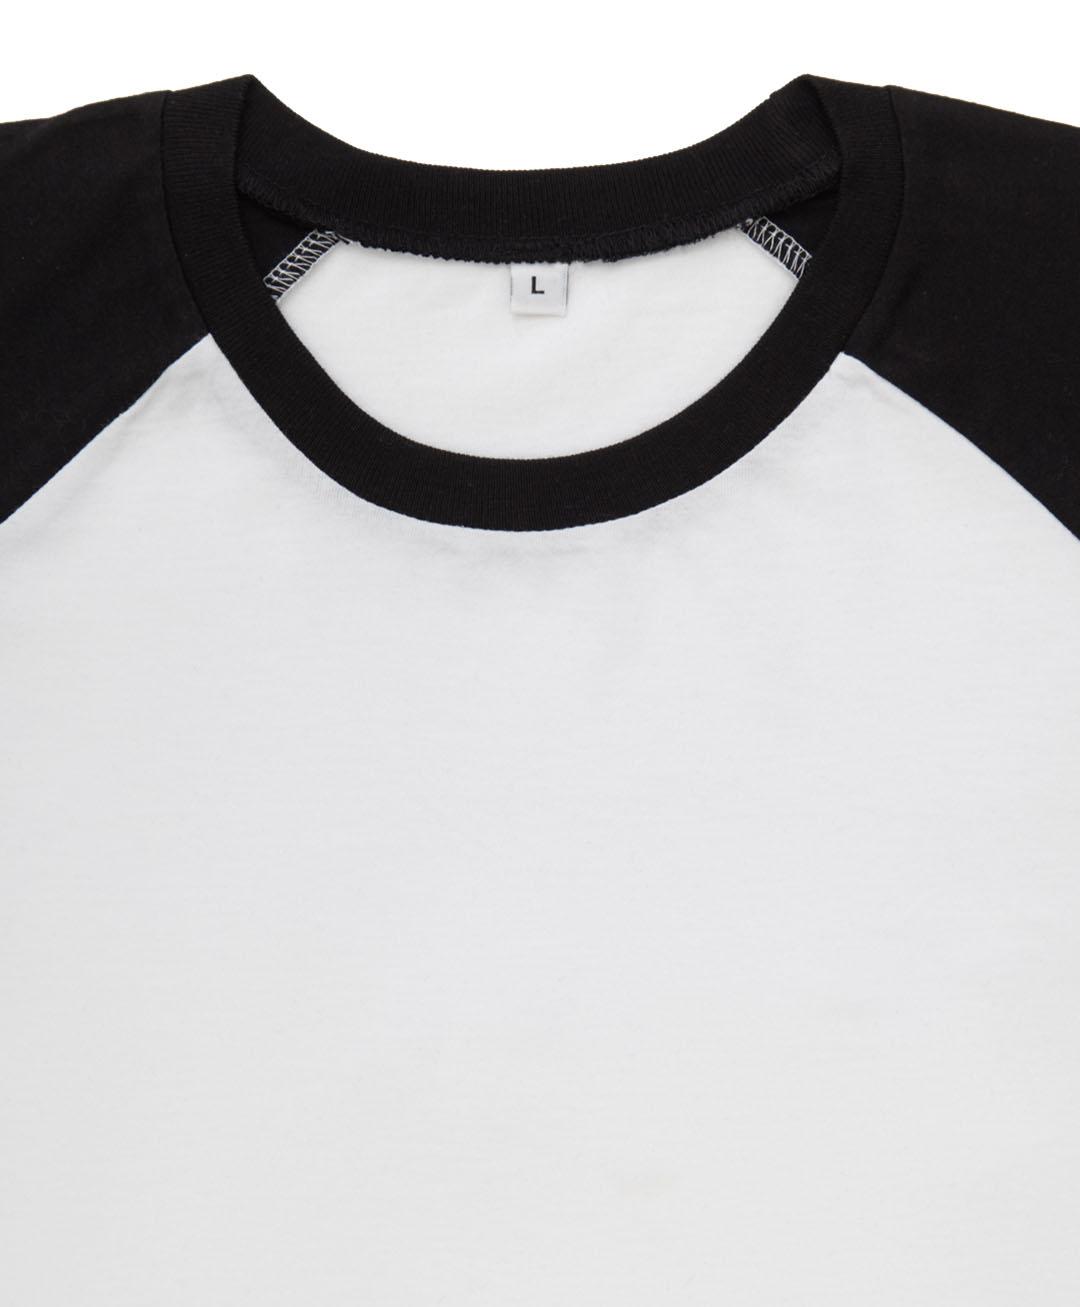 N22-neck